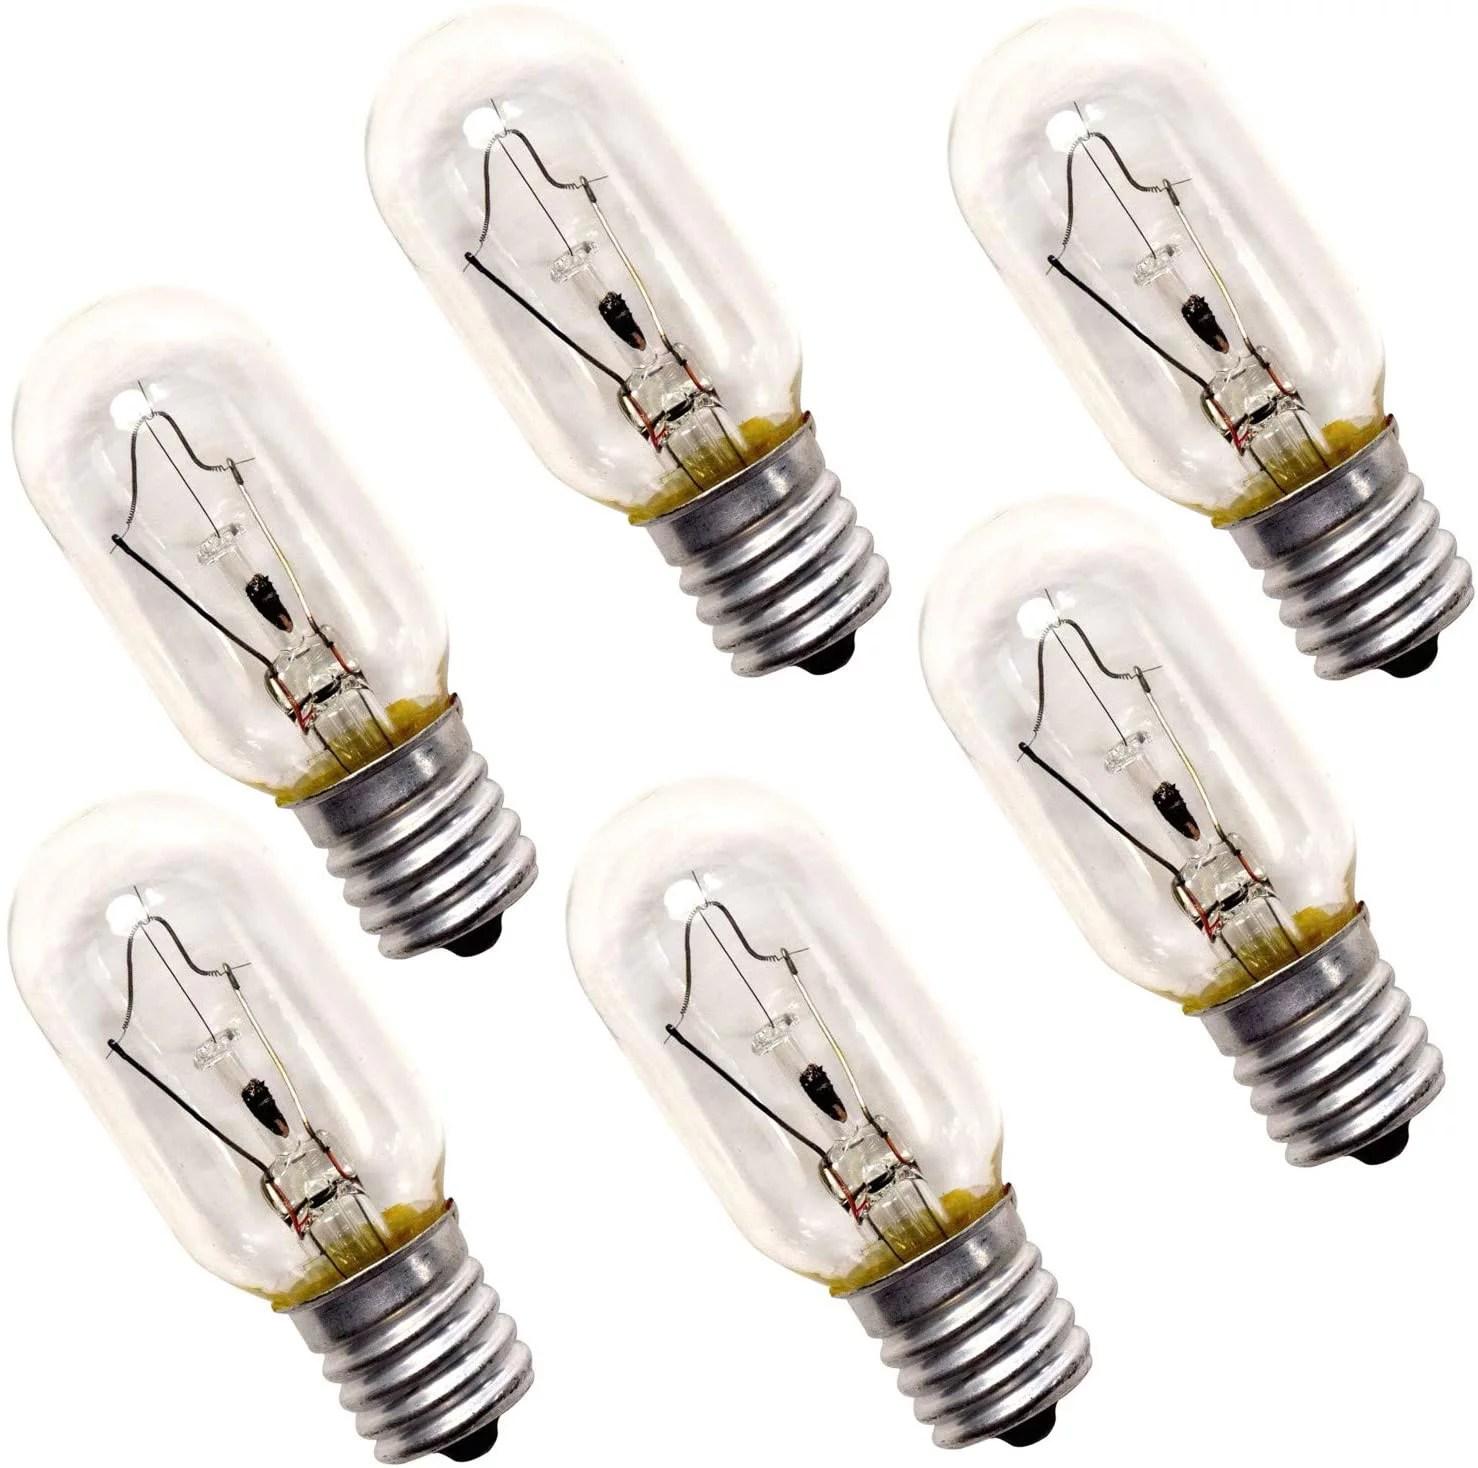 hqrp 6 pack 40 watt t8 intermediate e17 base incandescent light bulbs compatible with appliance microwave oven refrigerator kitchen vent hood range